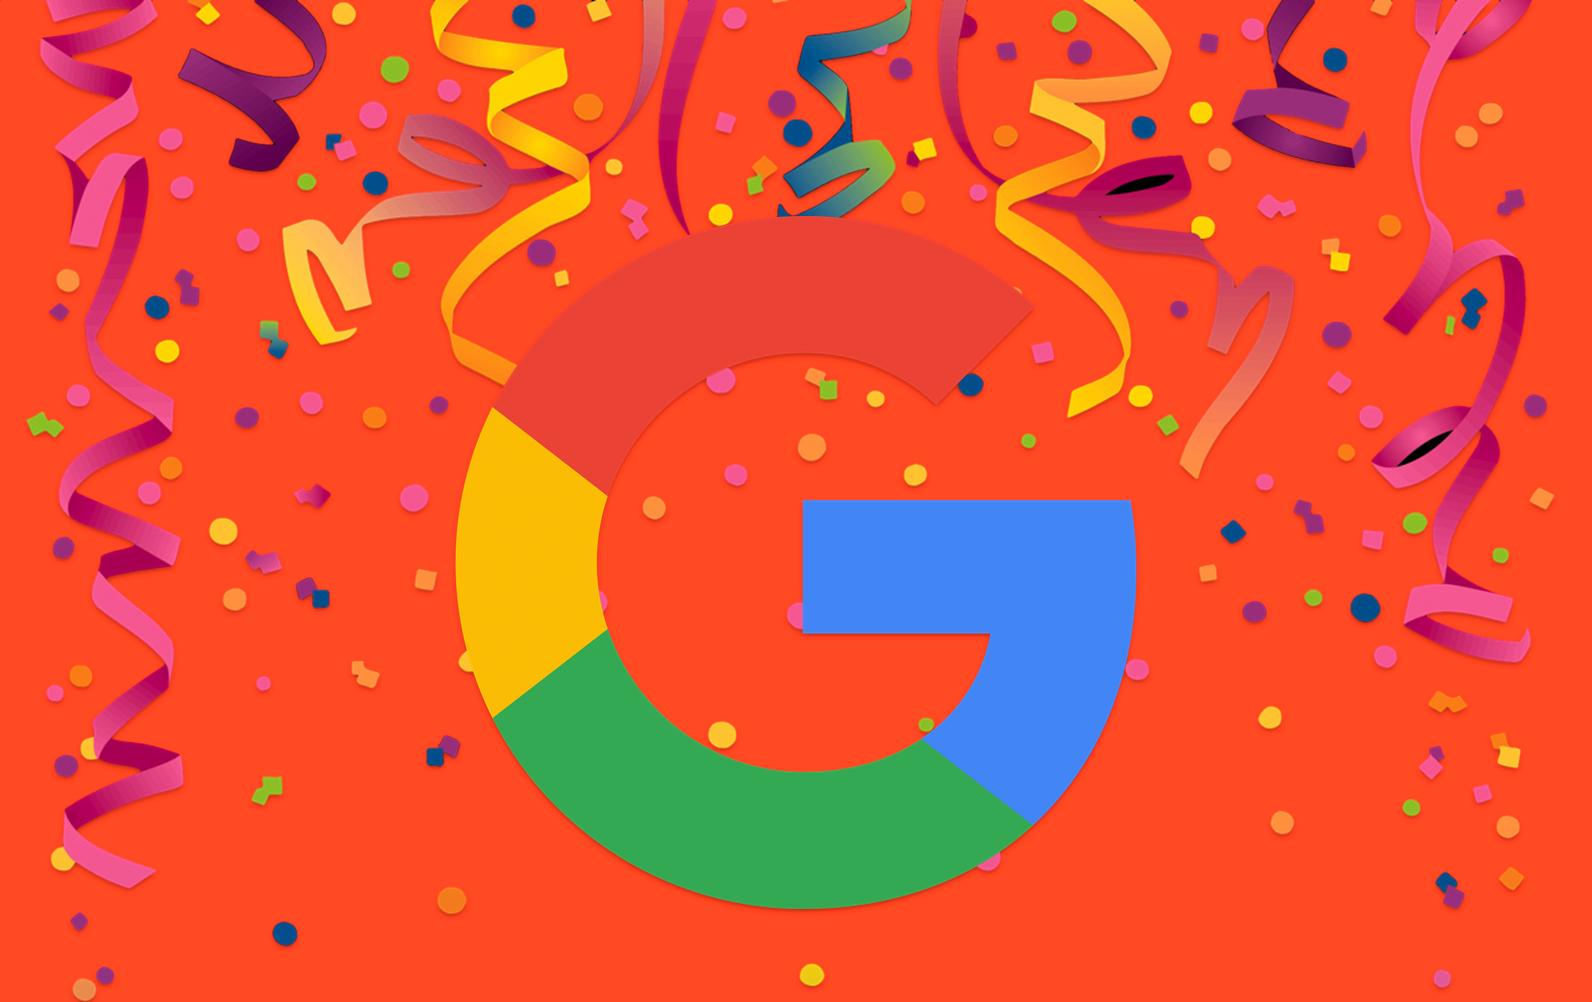 Blocos de carnaval 2020 google sao paulo rio de janeiro